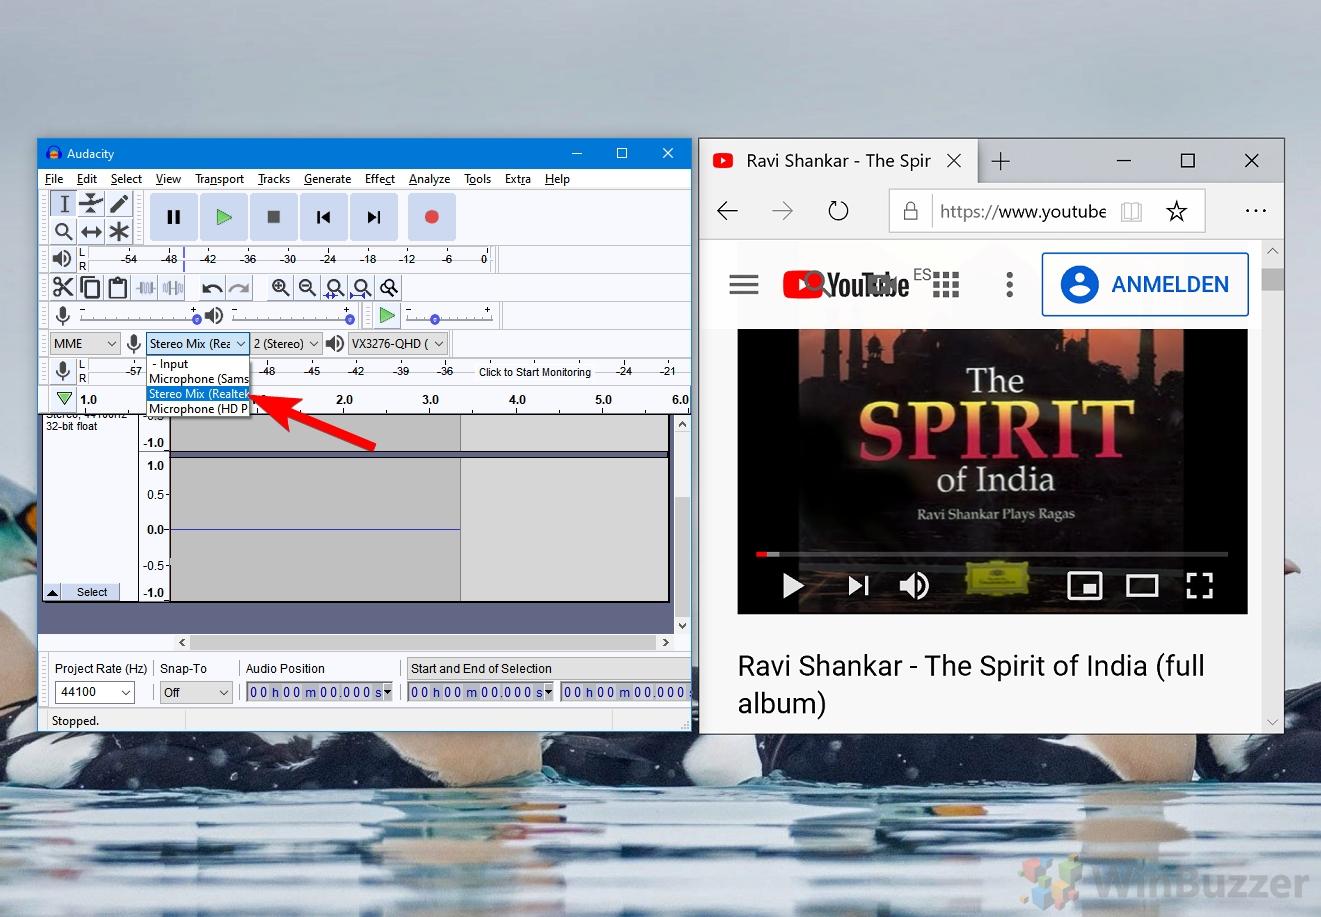 Windows 10 - Audacity - Setting Stereo Mix as Recording Device